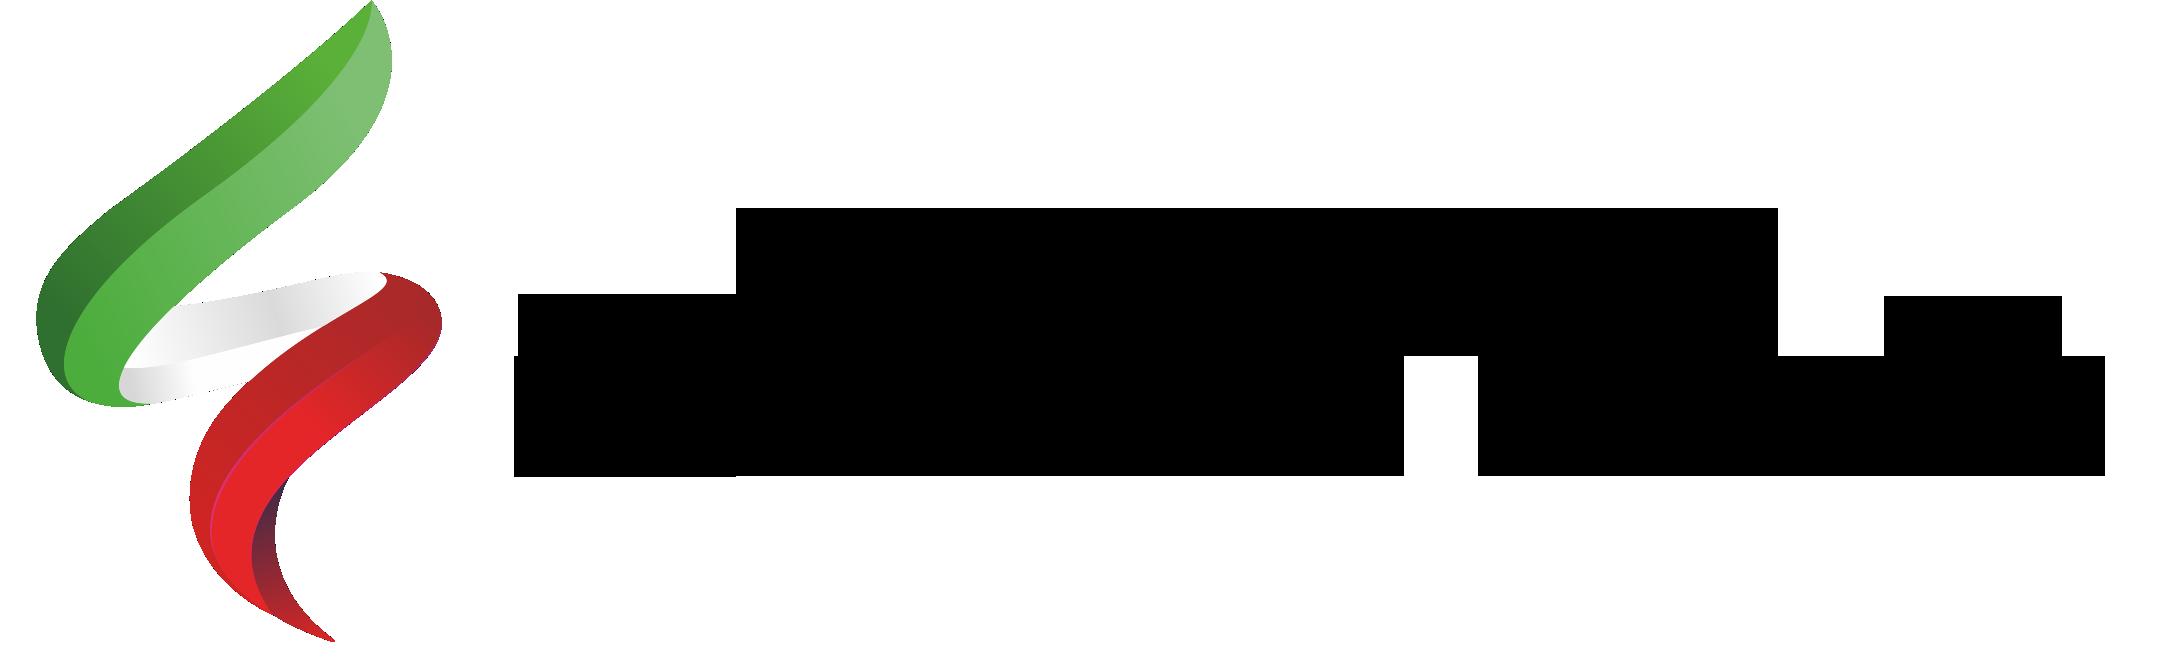 Gruppo Servizitalia